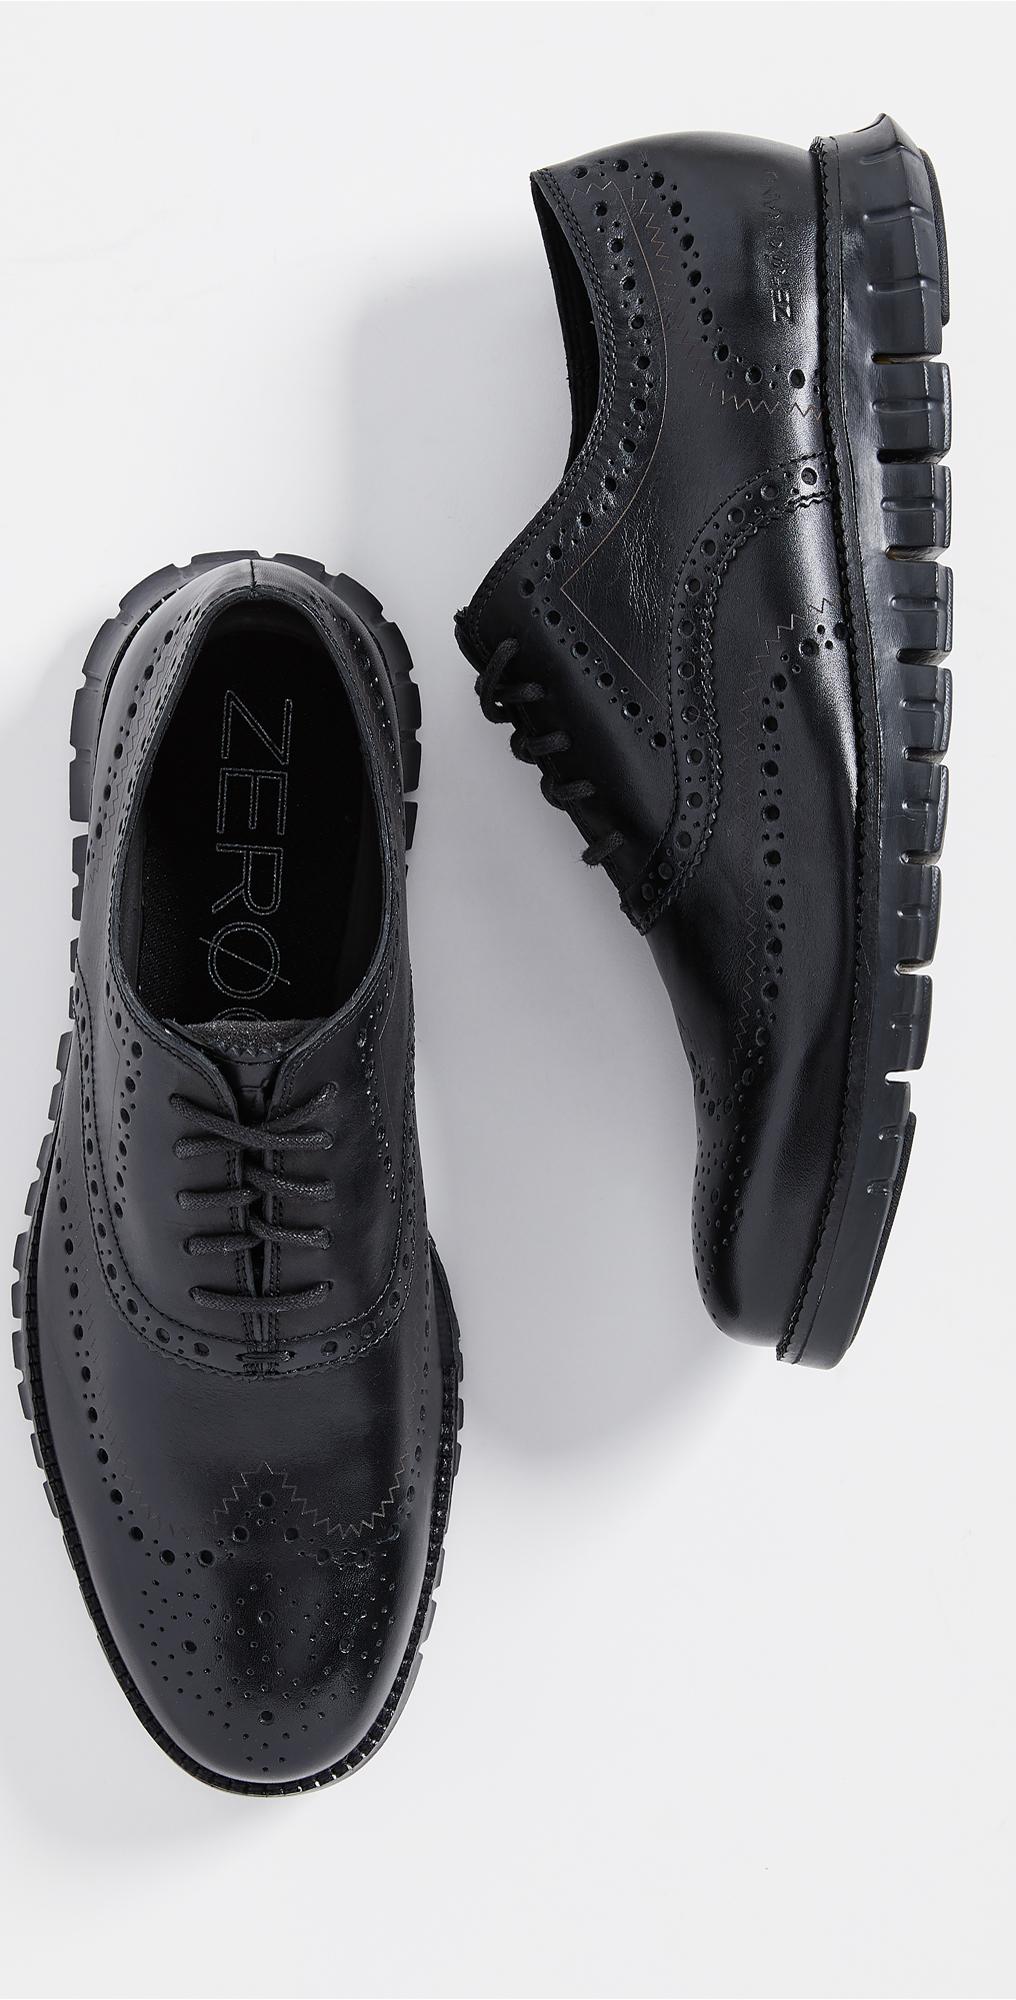 cohan shoes canada buy clothes shoes online